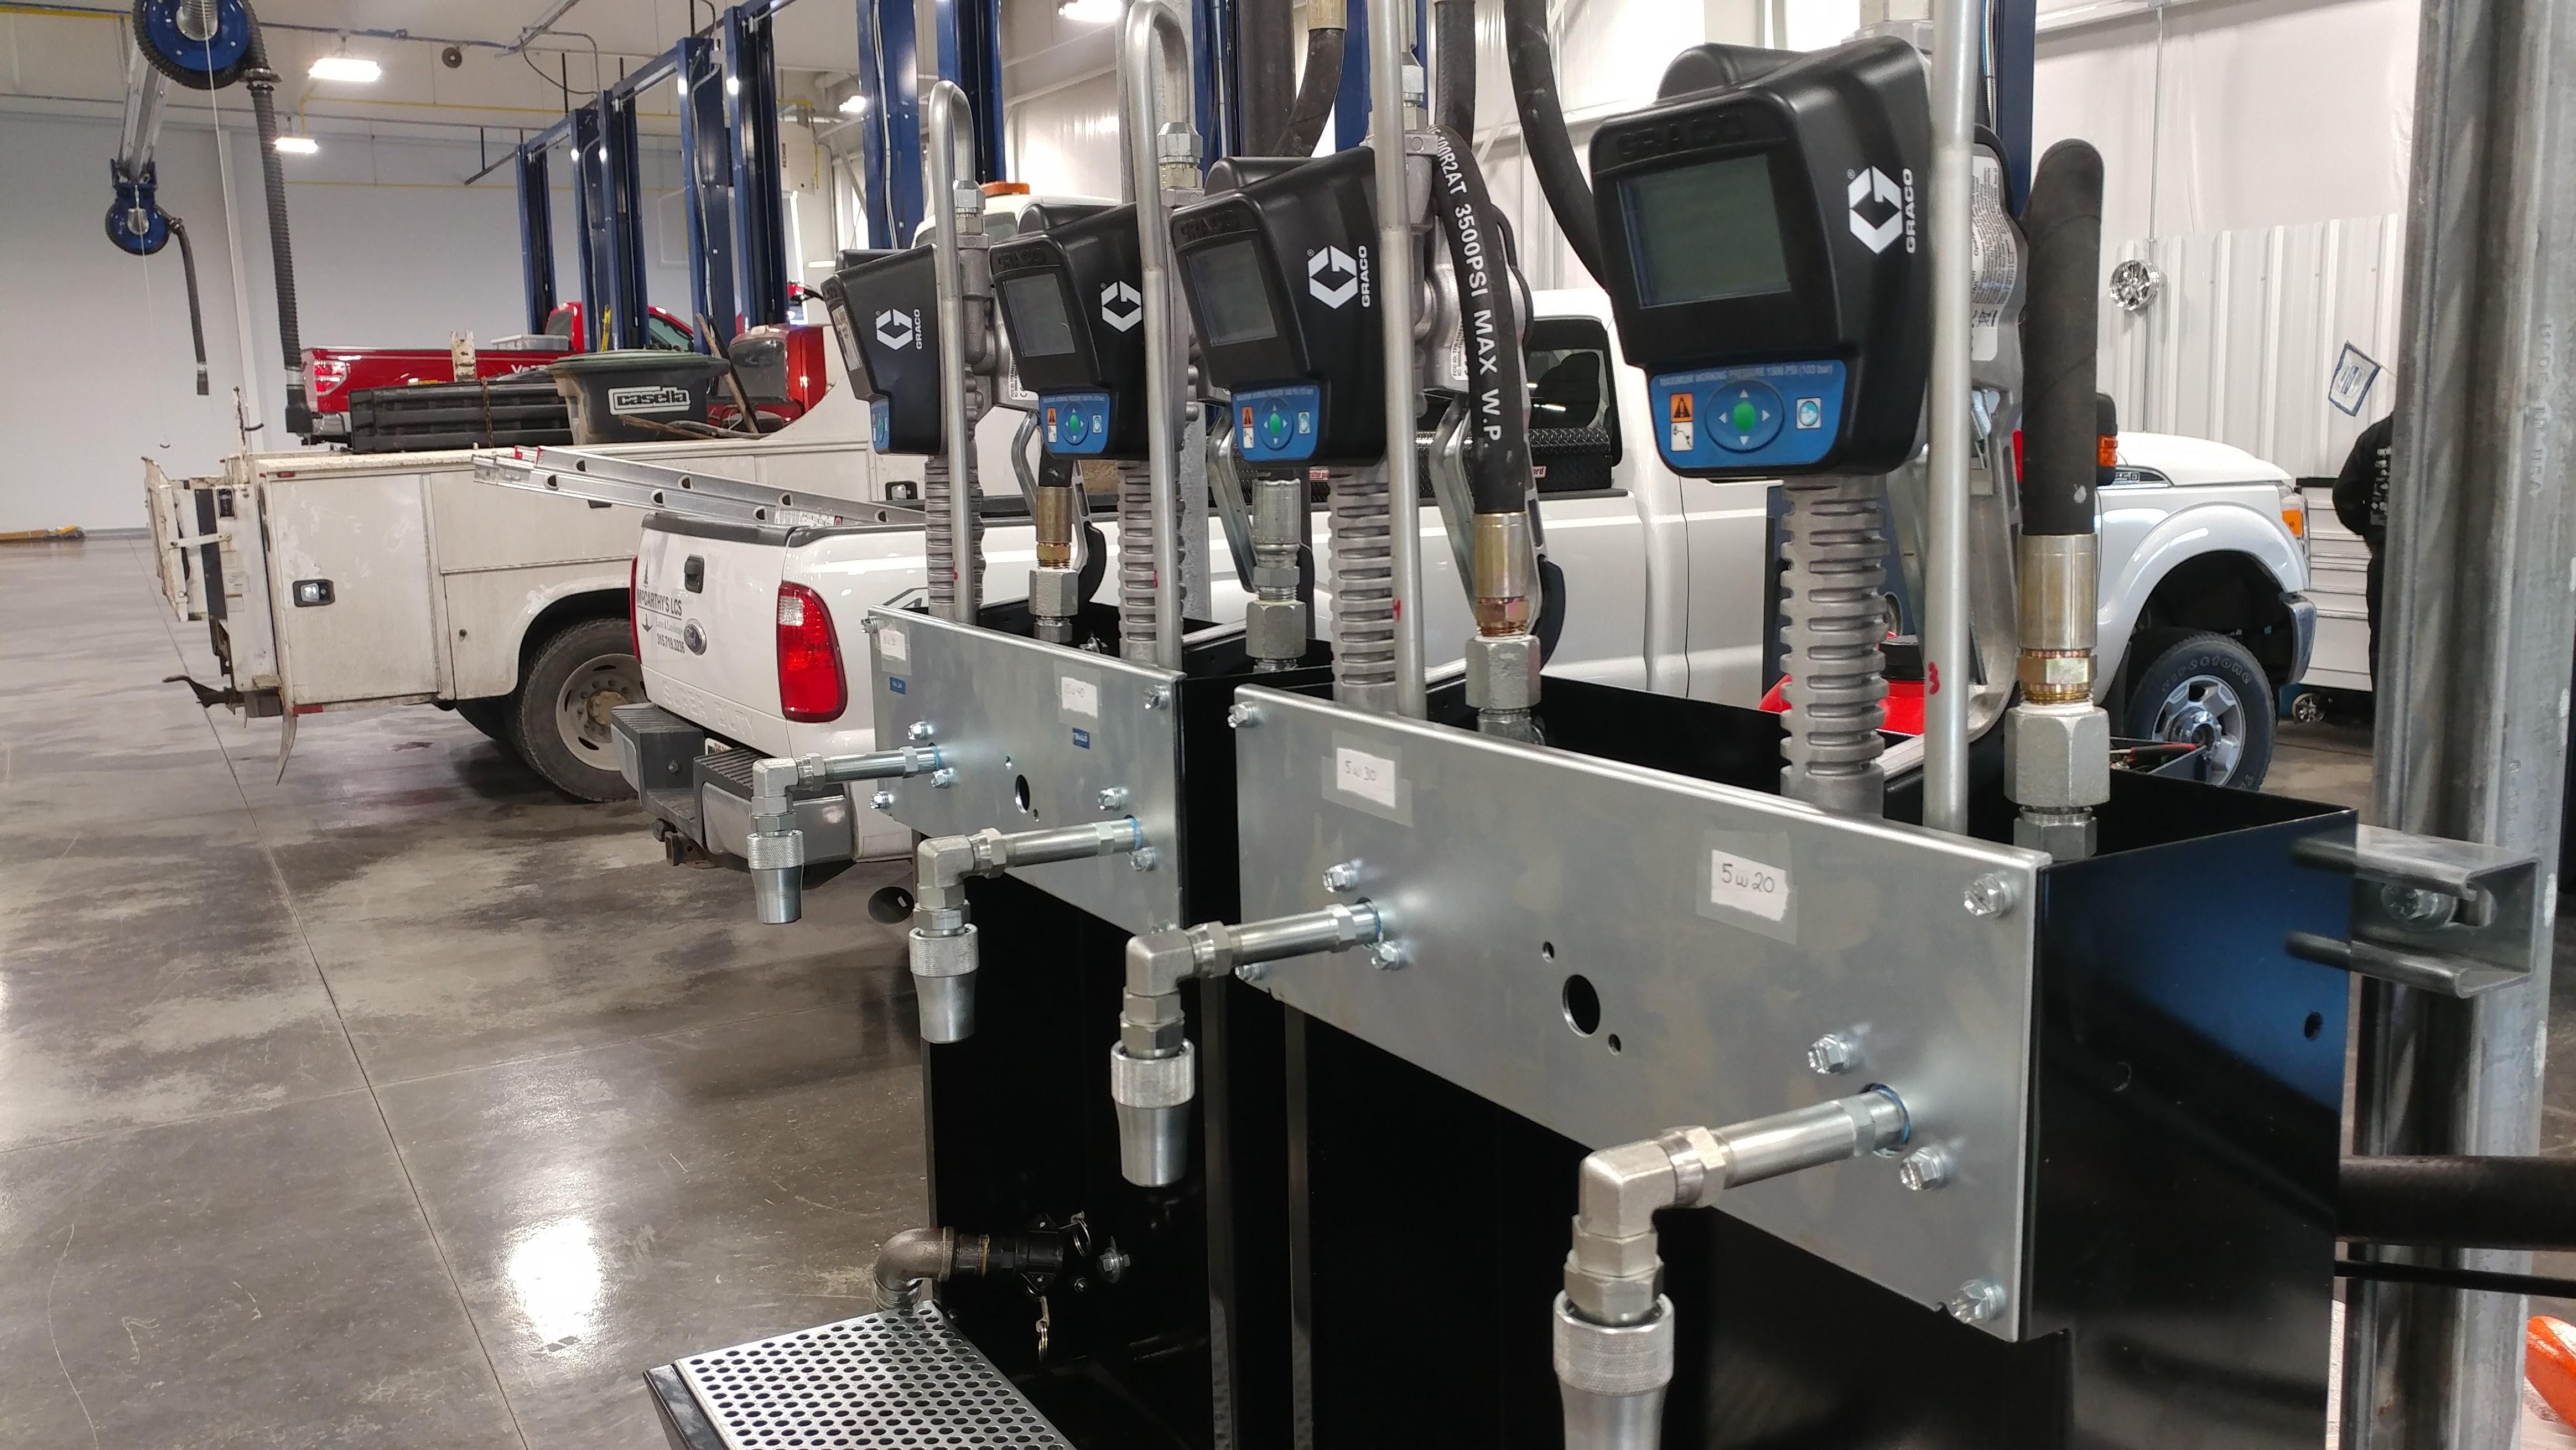 Graco Matrix Inventory System